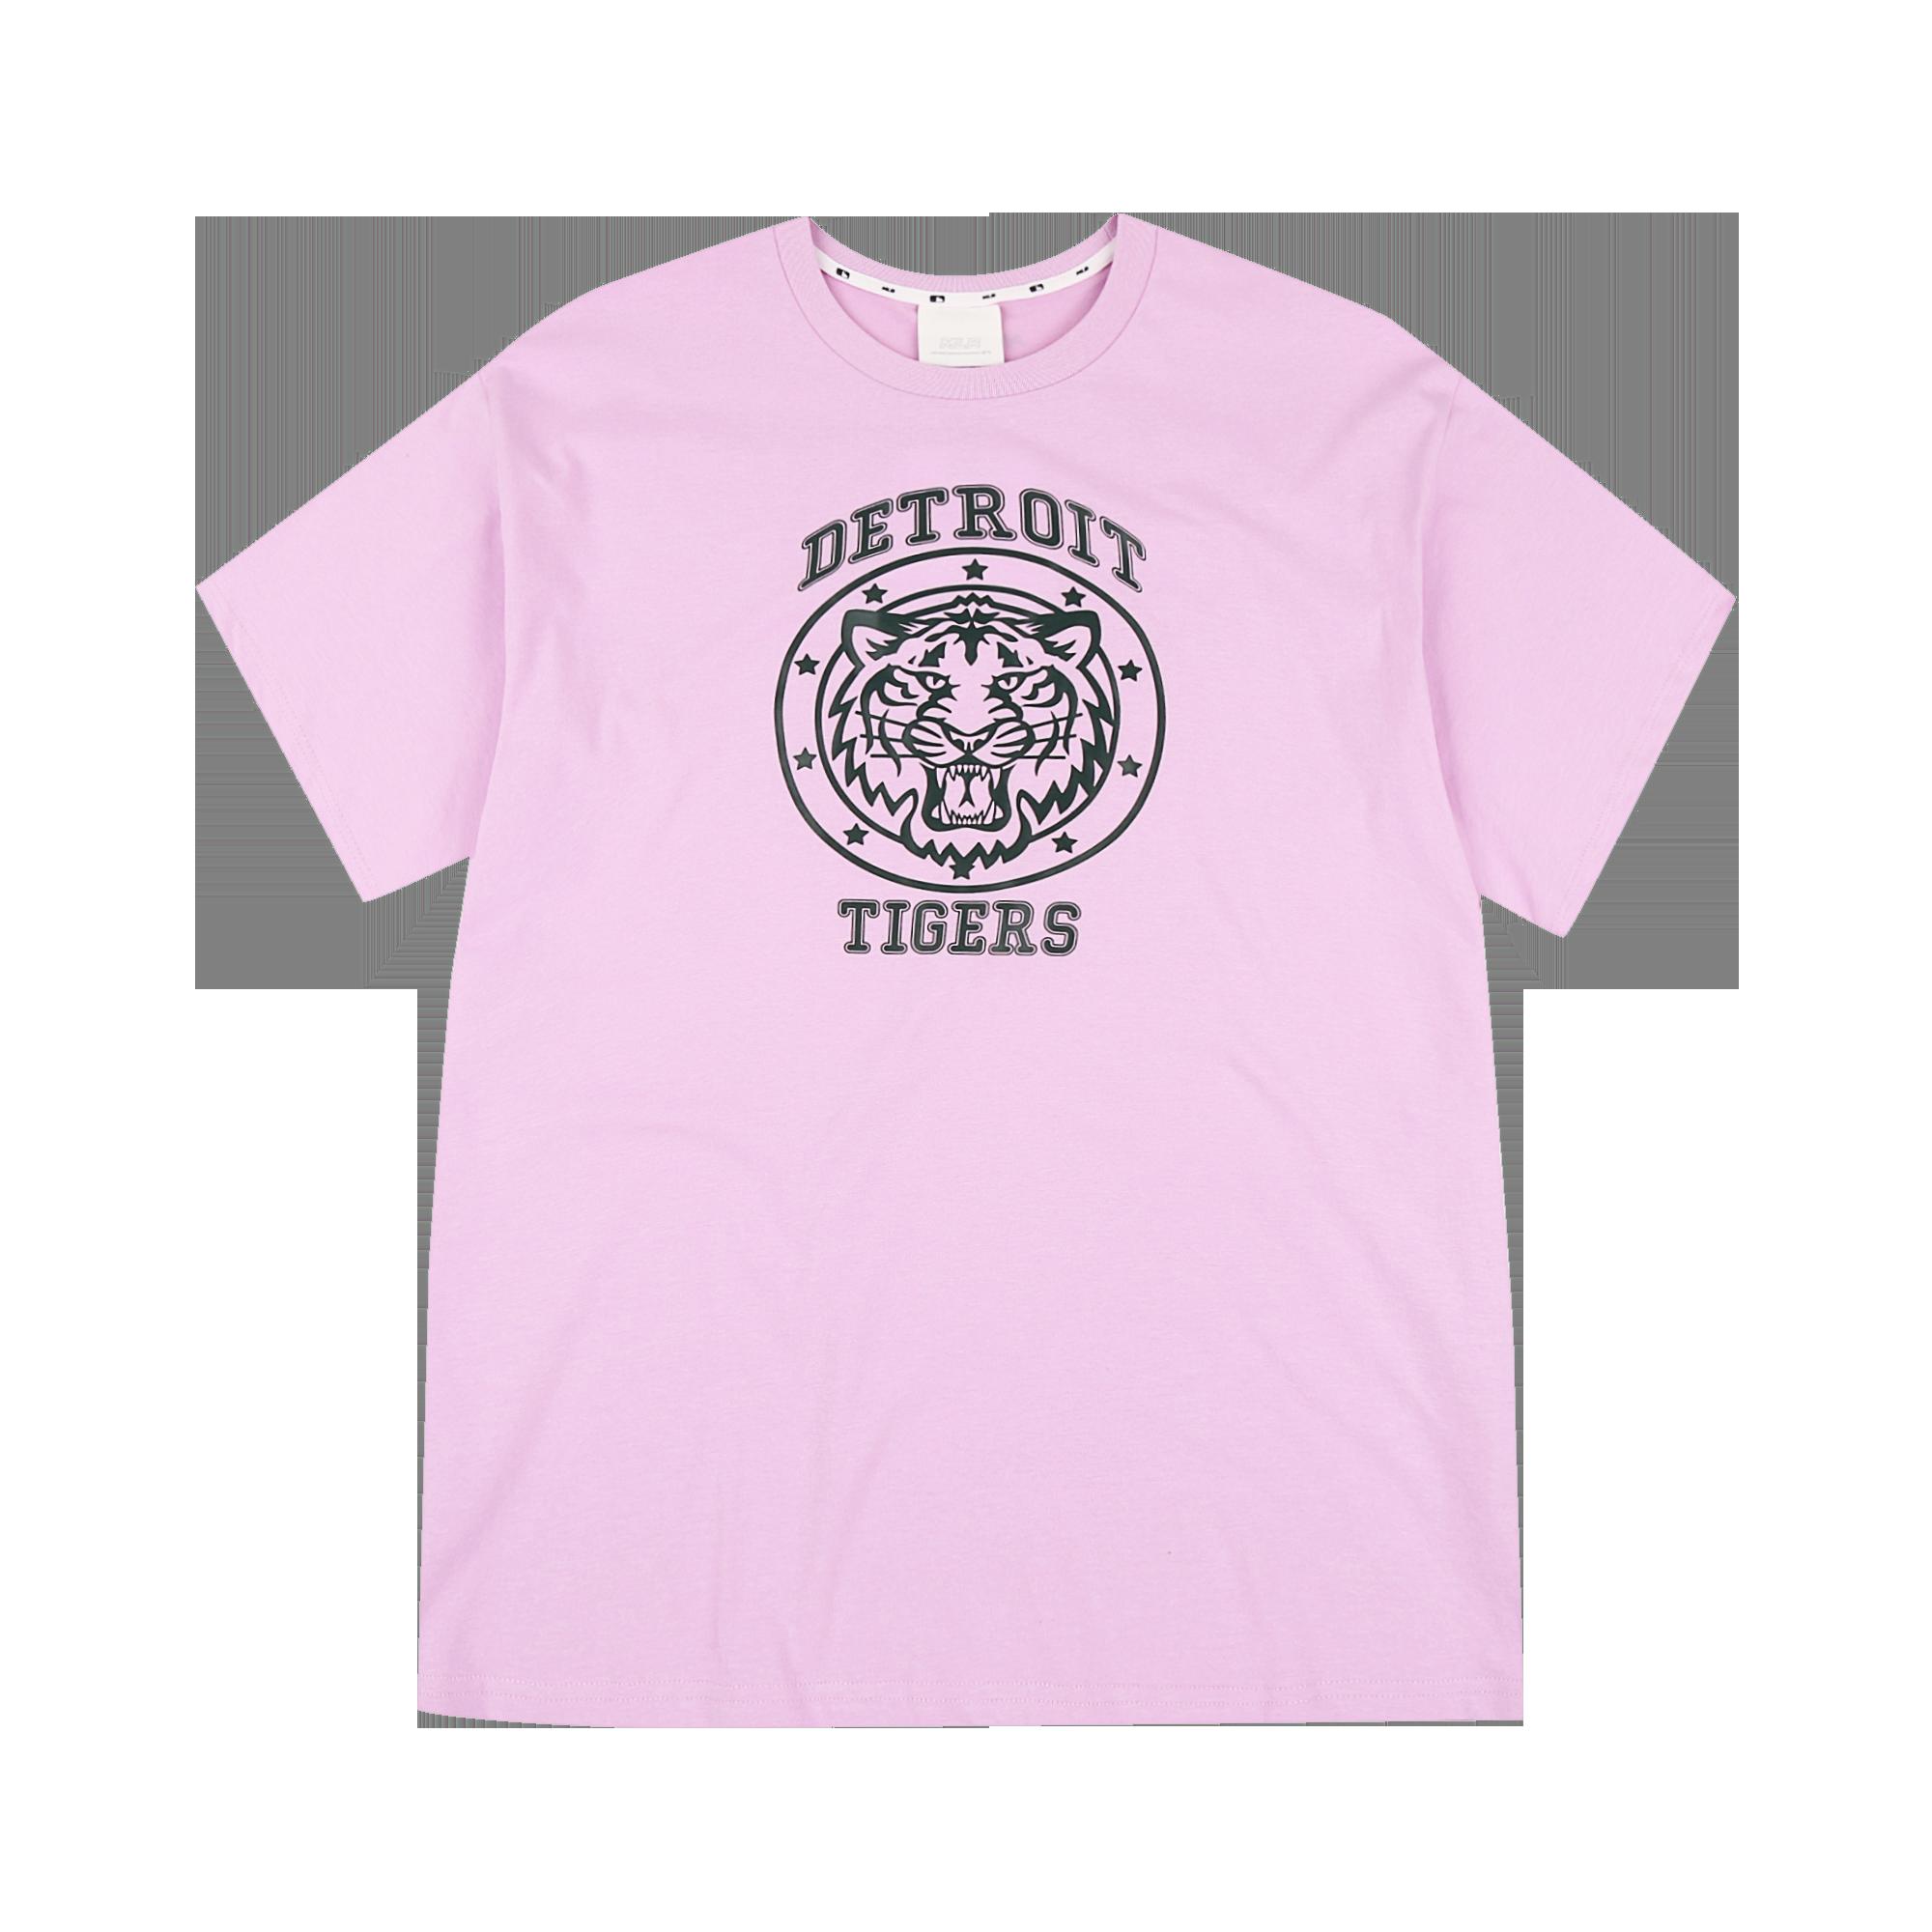 DETROIT TIGERS CIRCLE SHORT SLEEVE T-SHIRT